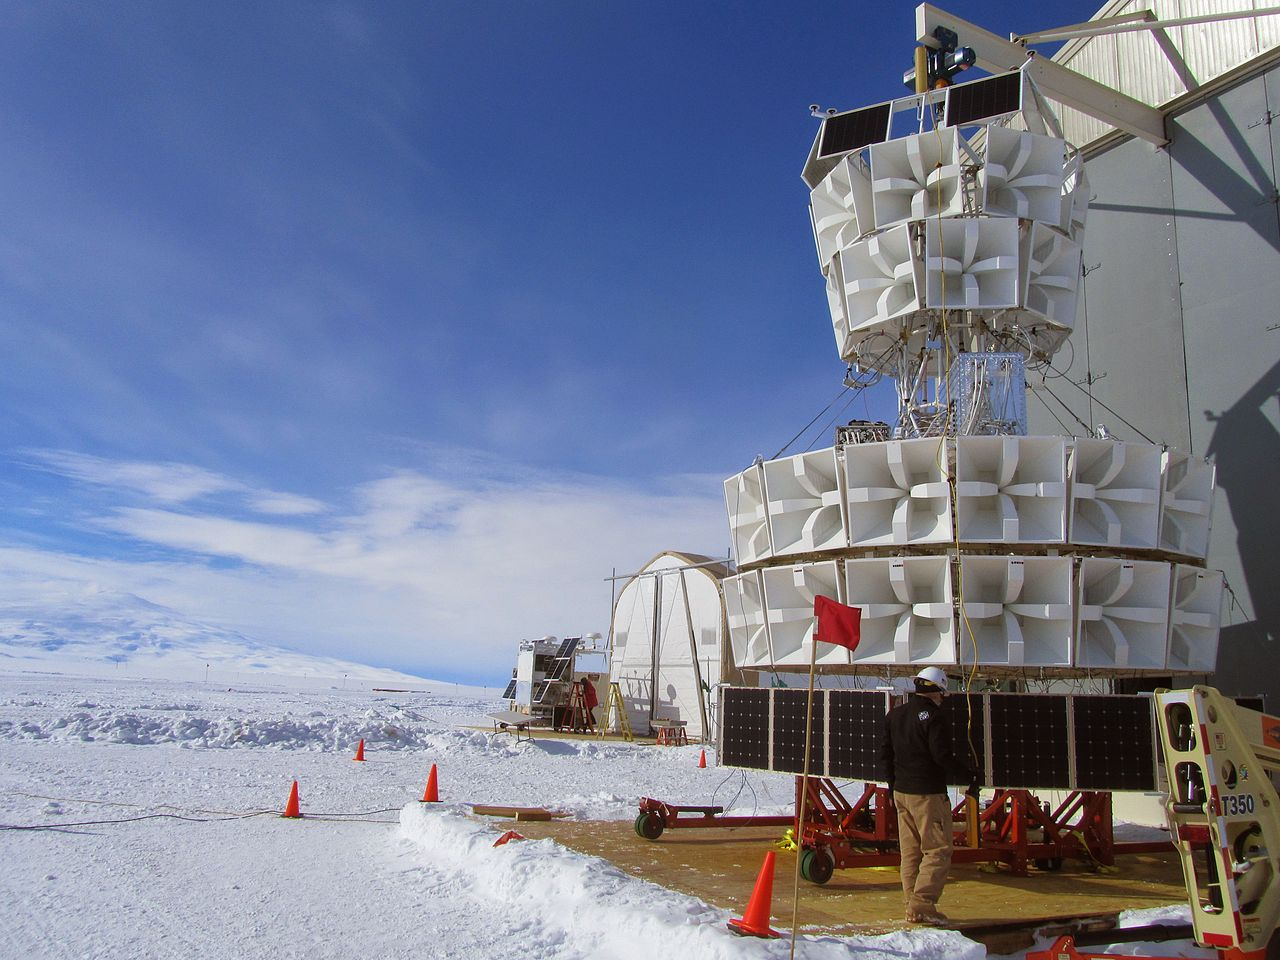 Inexplicable particles found in Antarctica